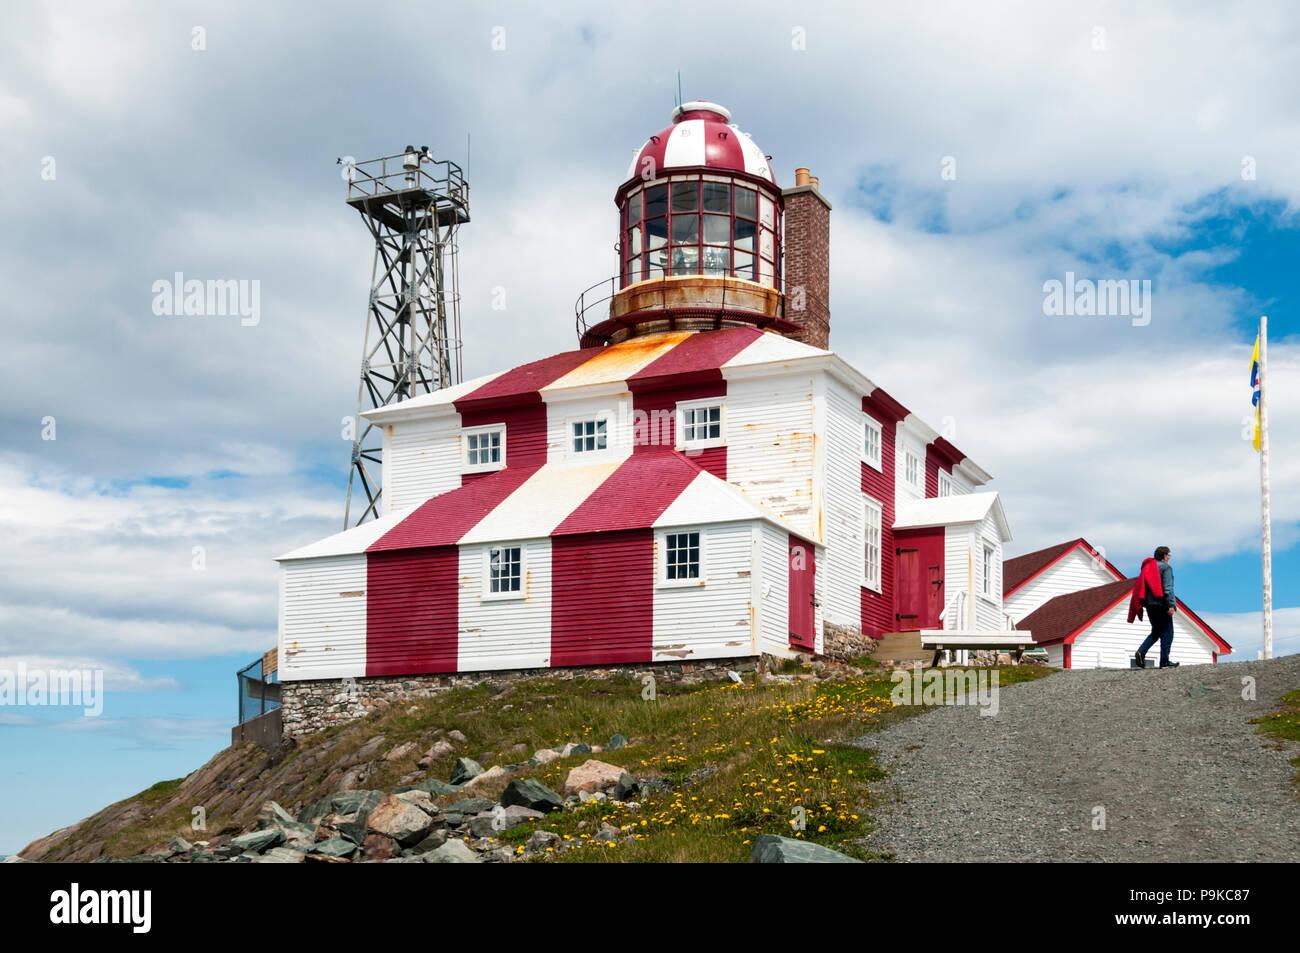 Bonavista lighthouse at Cape Bonavista, Newfoundland. - Stock Image